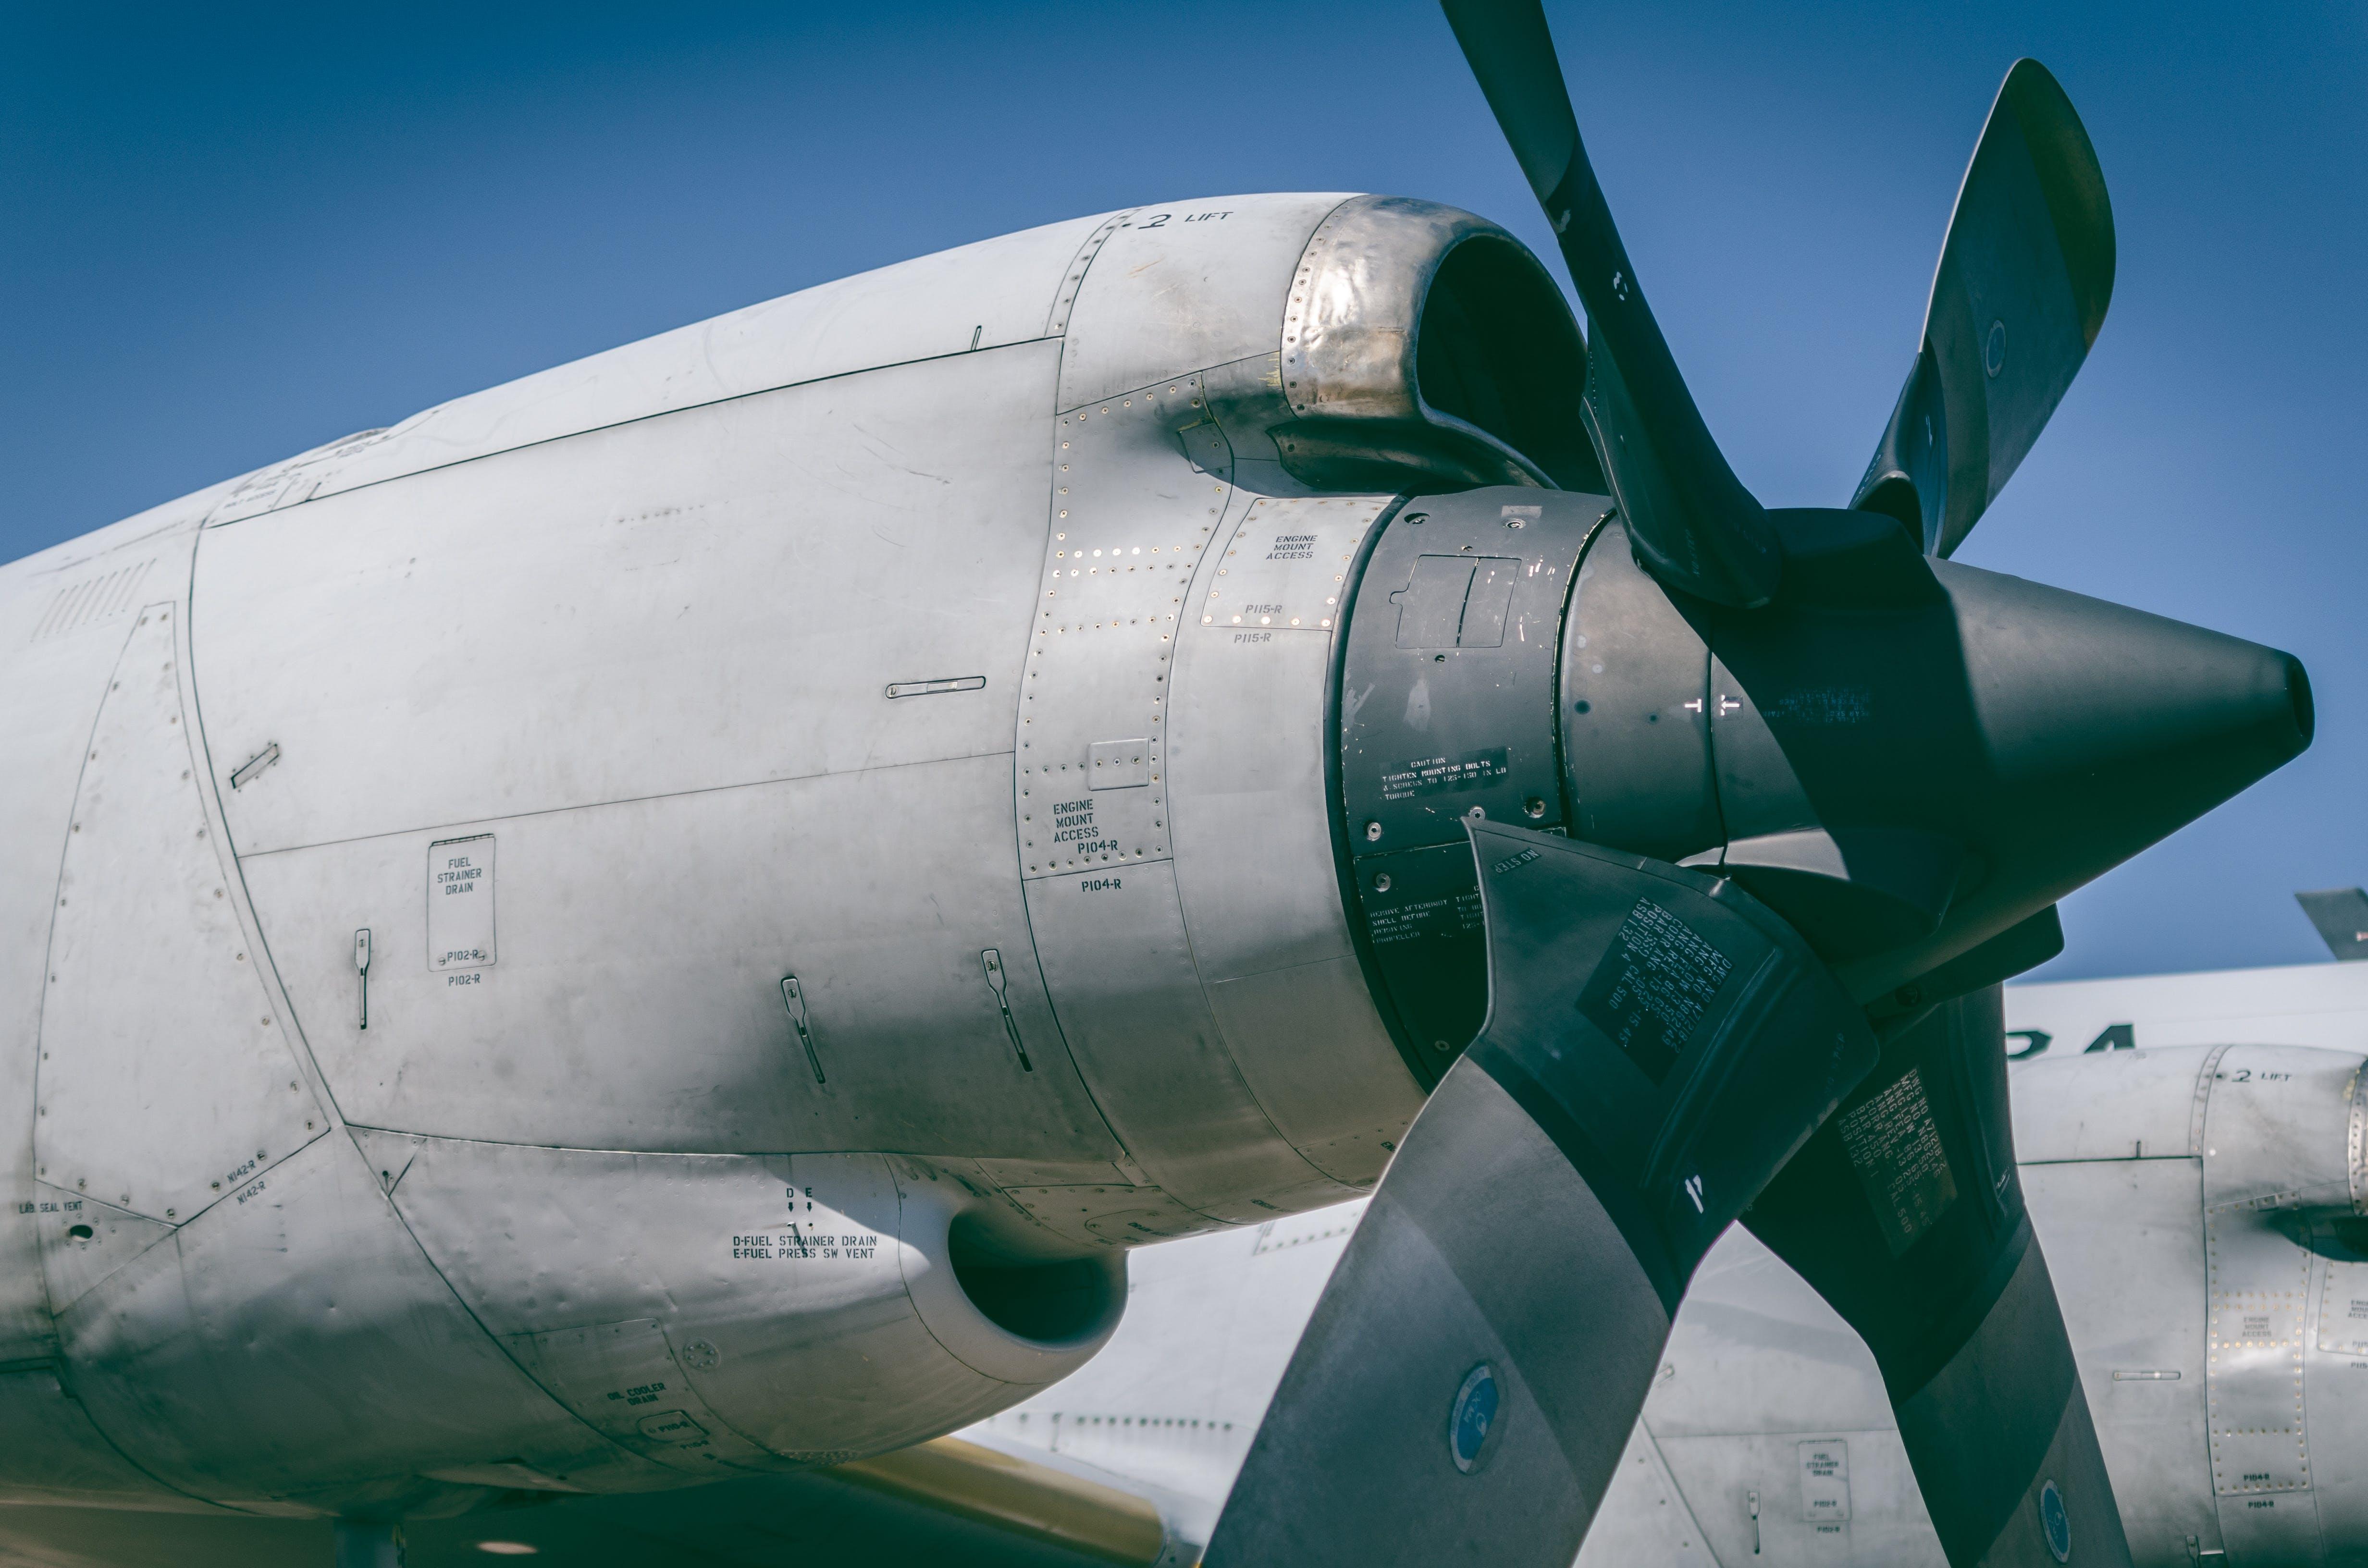 flugzeug, flugzeugpropeller, luftfahrt